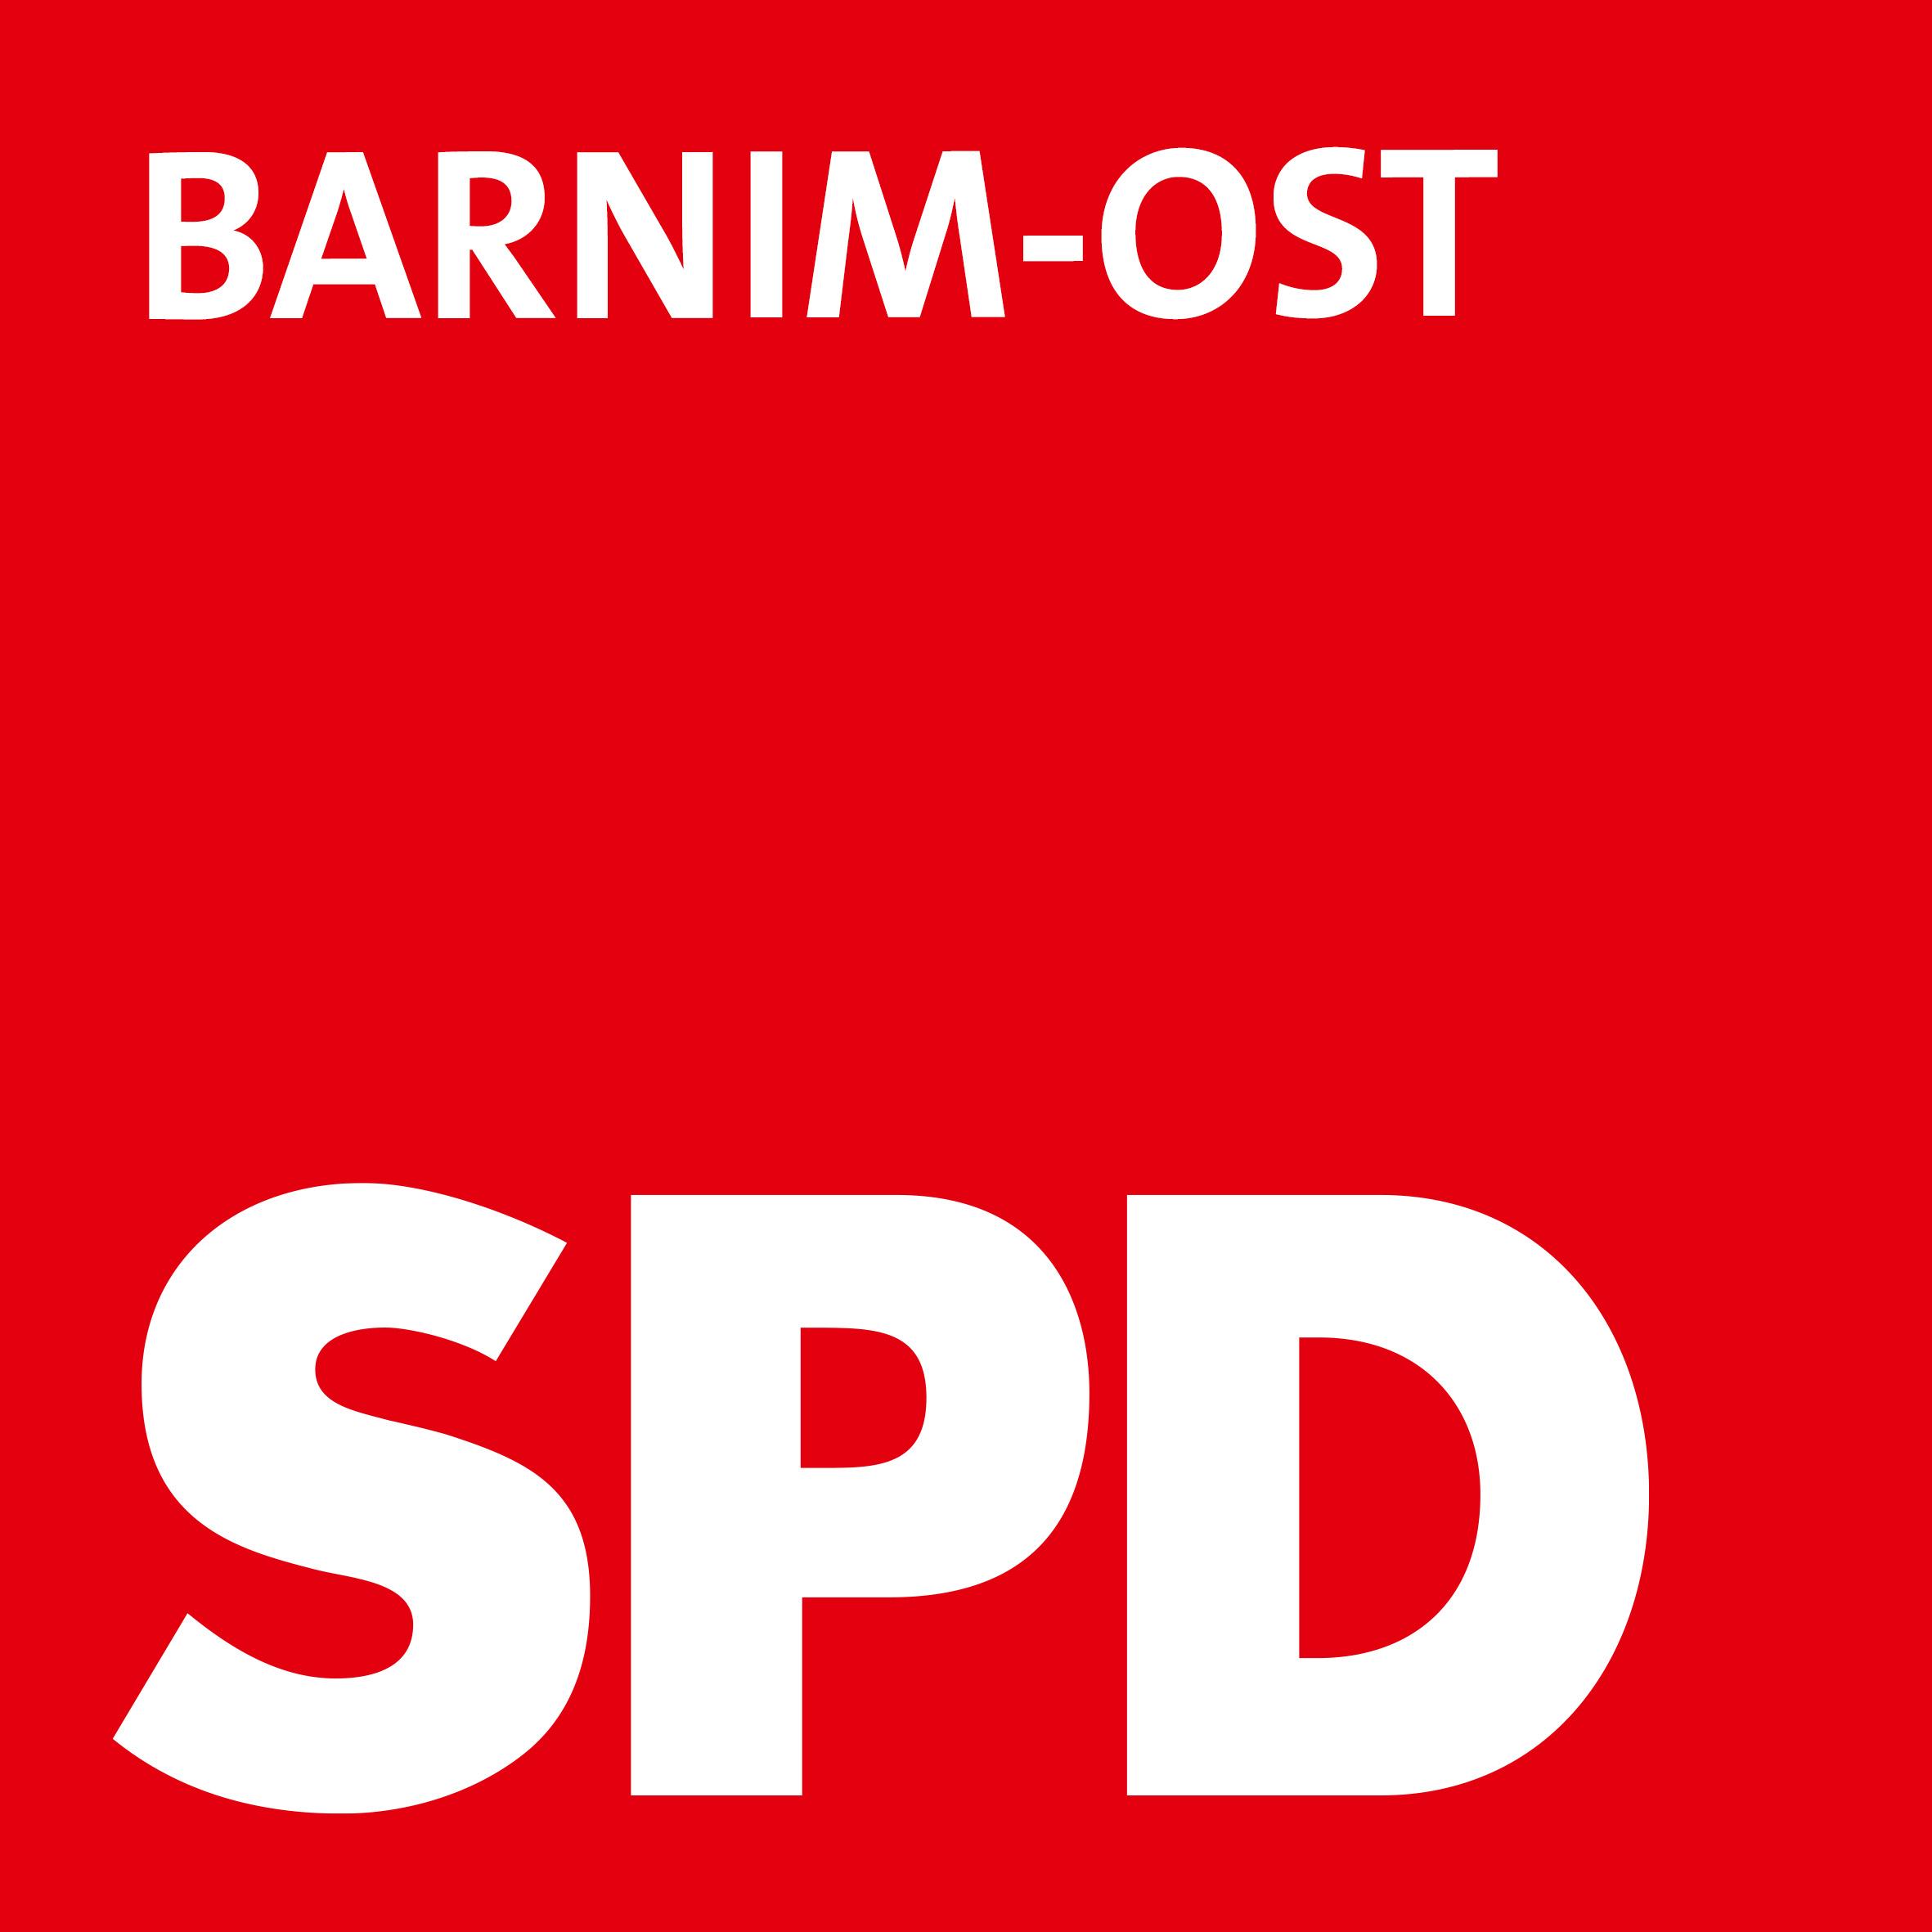 SPD Barnim-Ost